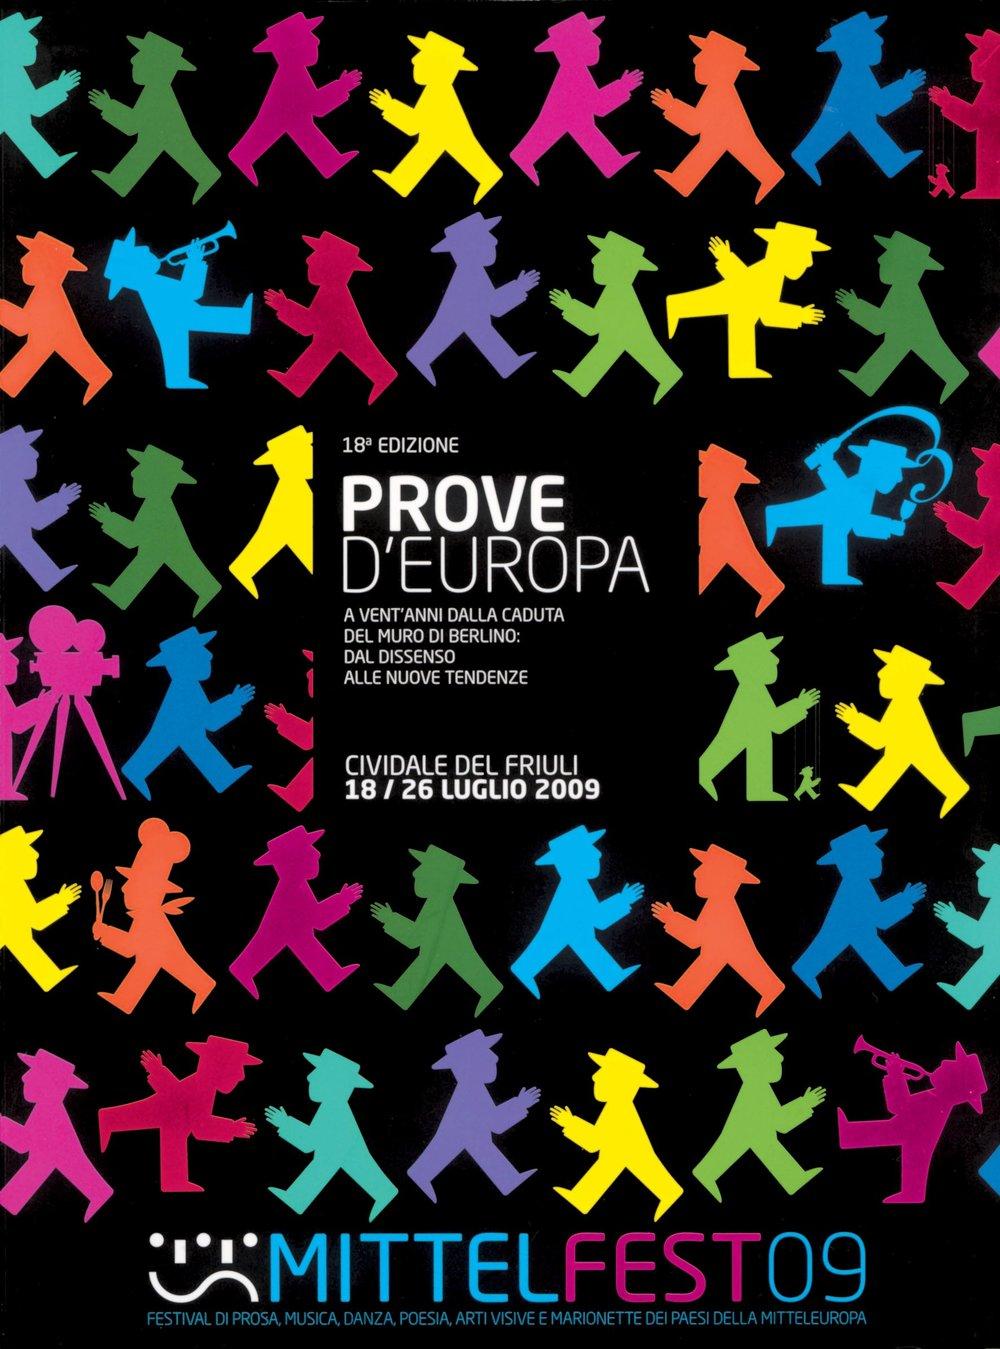 2009 Prove D'Europa